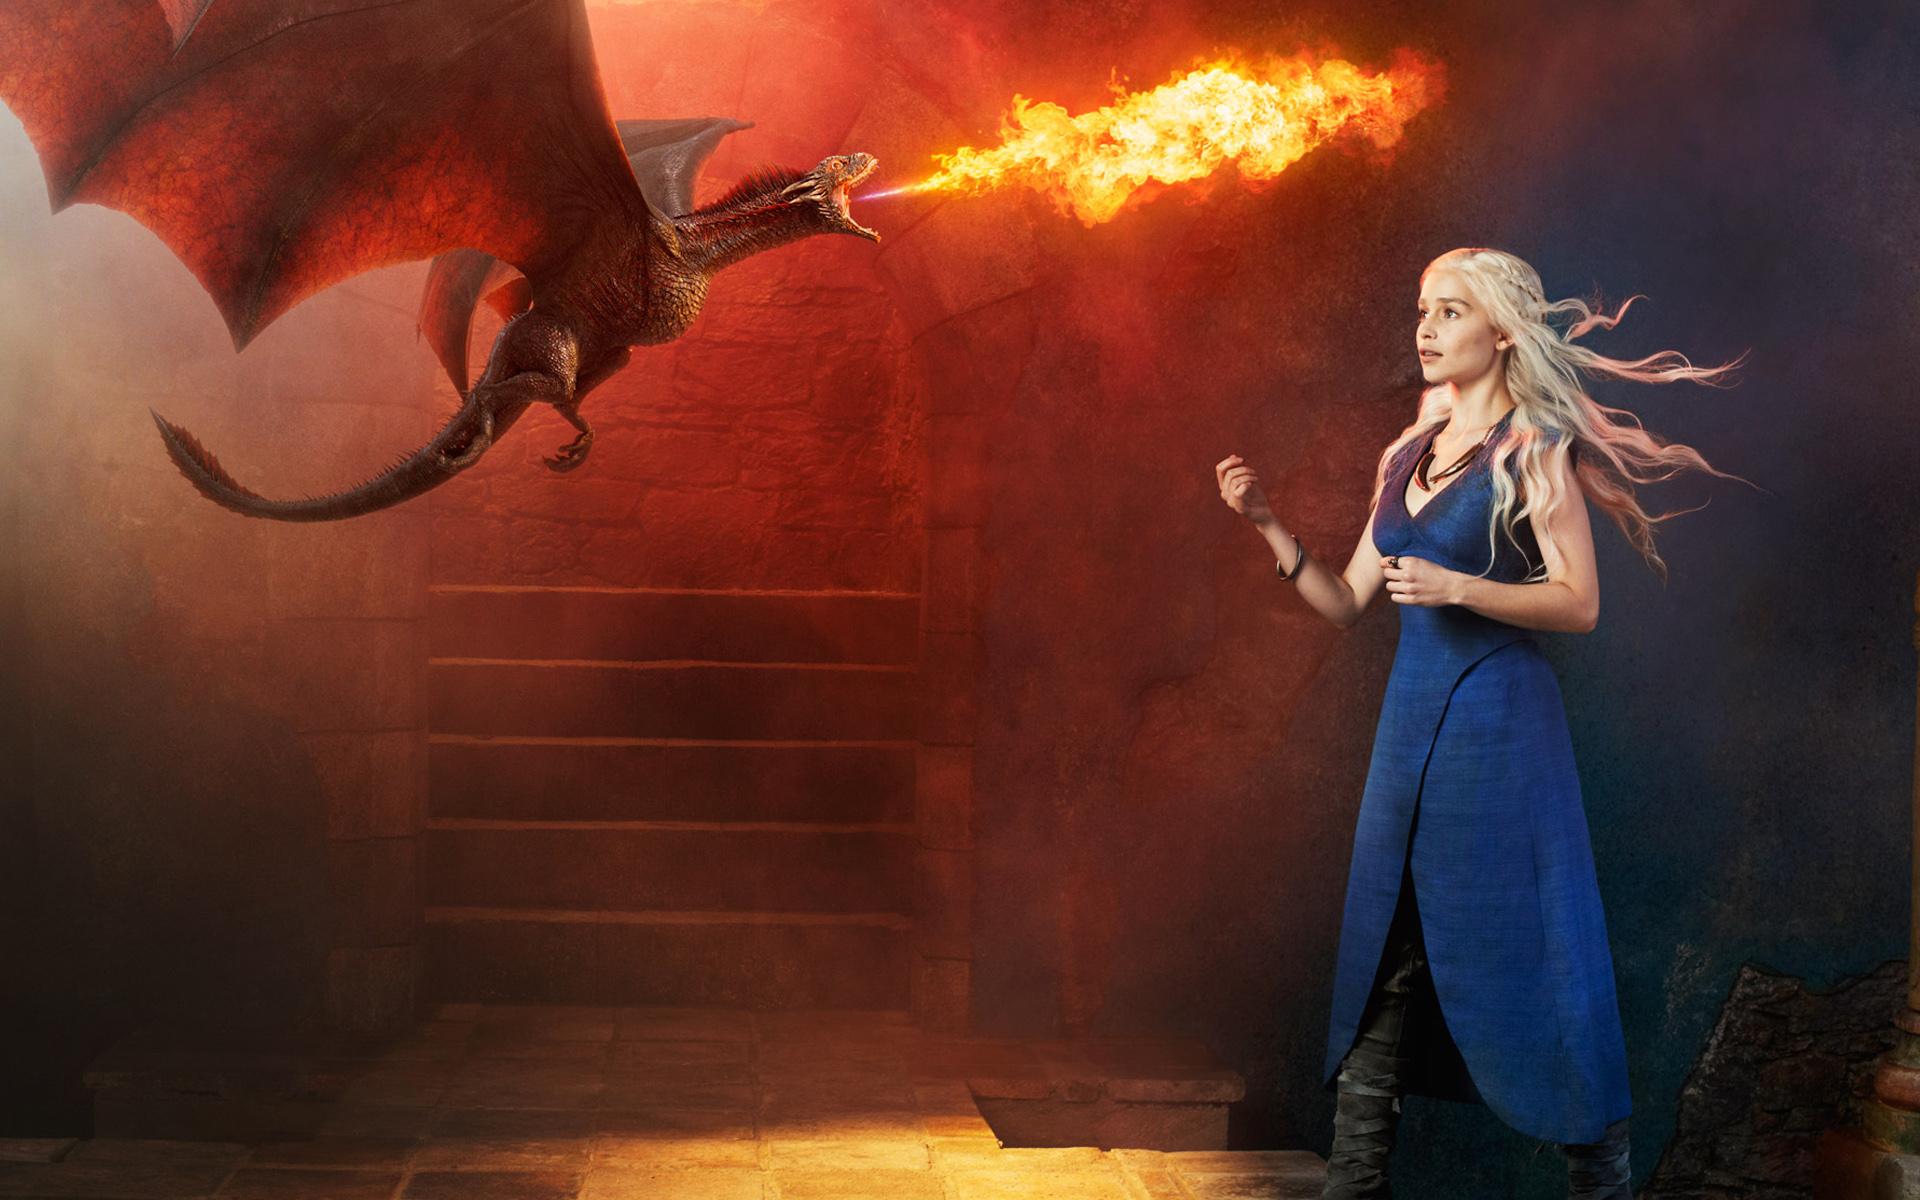 Emilia Clark es Daenerys - 1920x1200